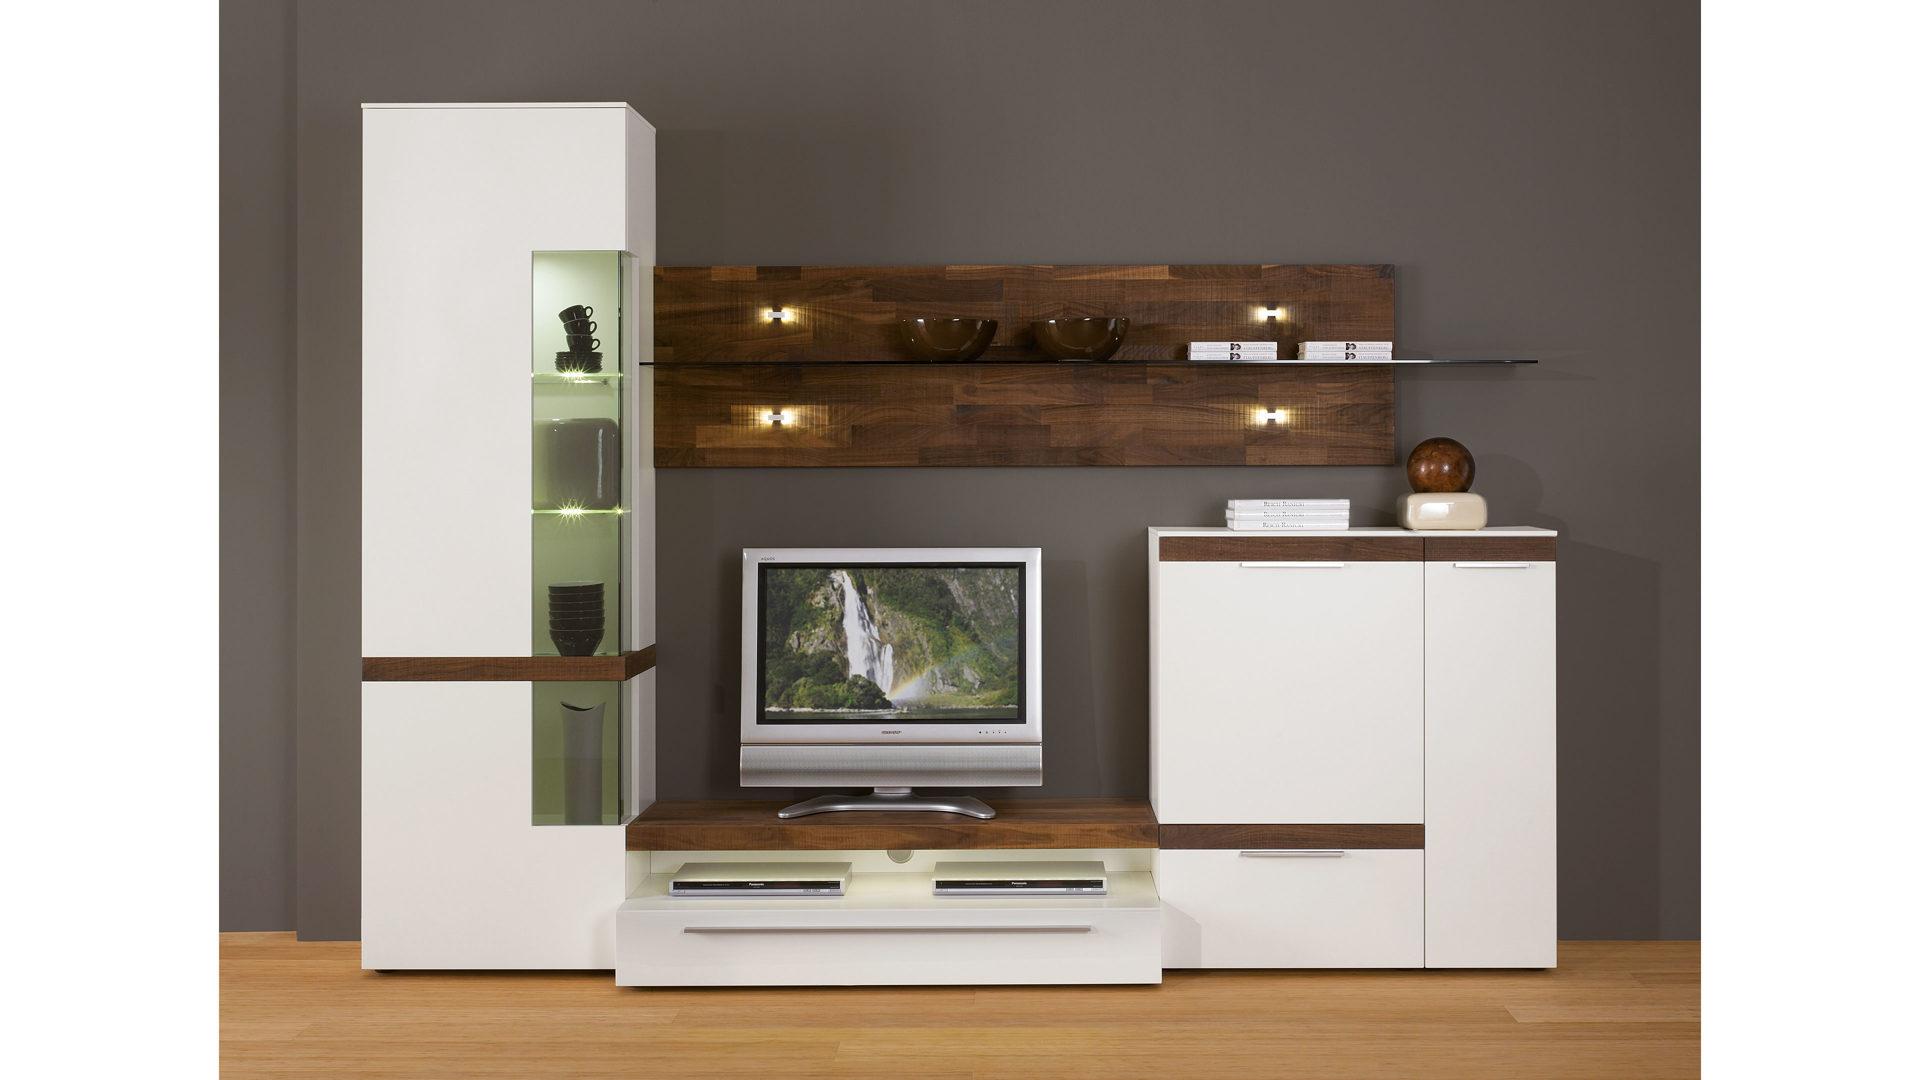 fernseh wand modern holz - wohndesign -